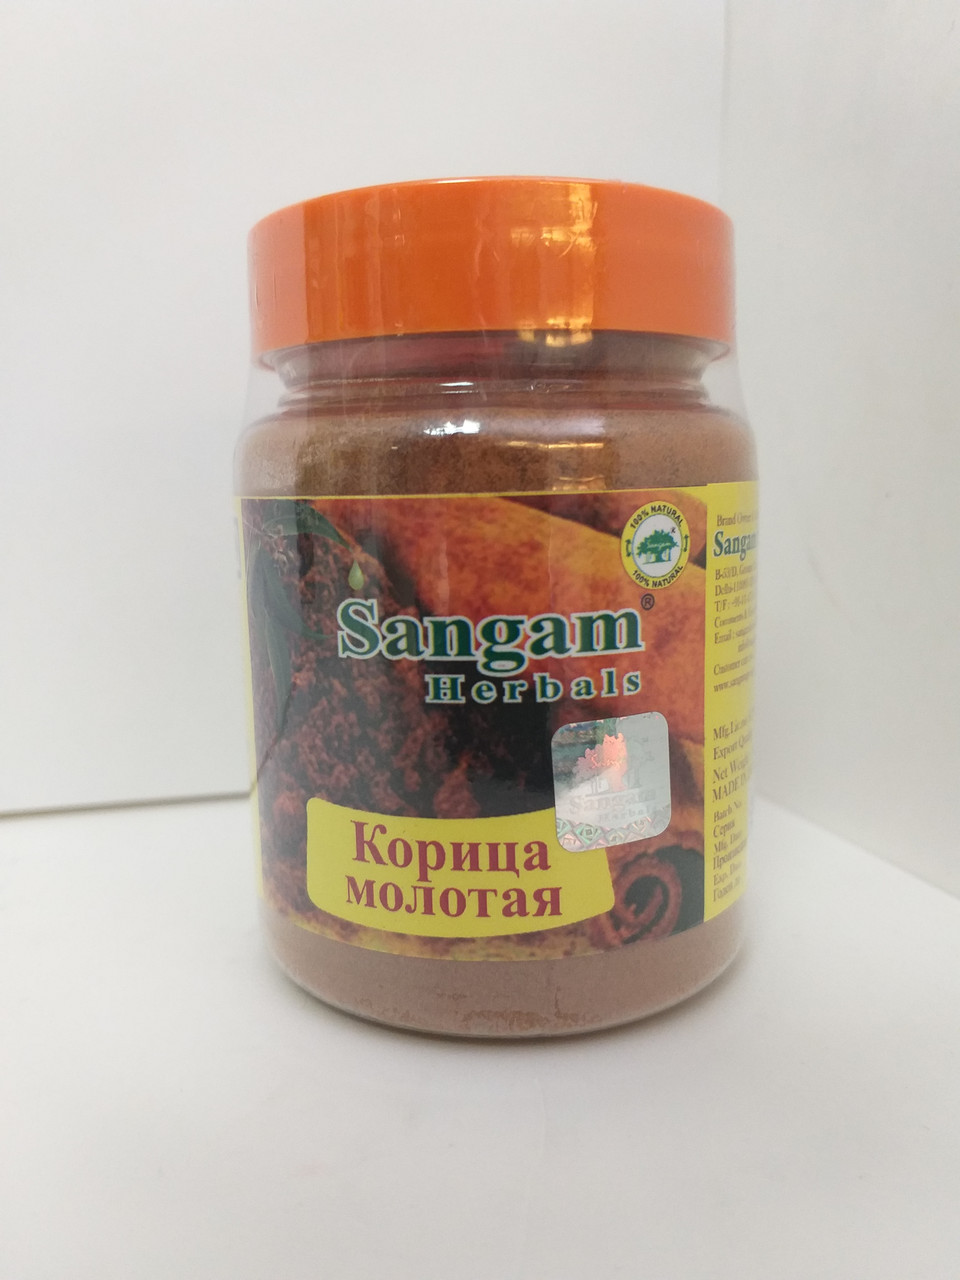 Корица молотая, Сангам